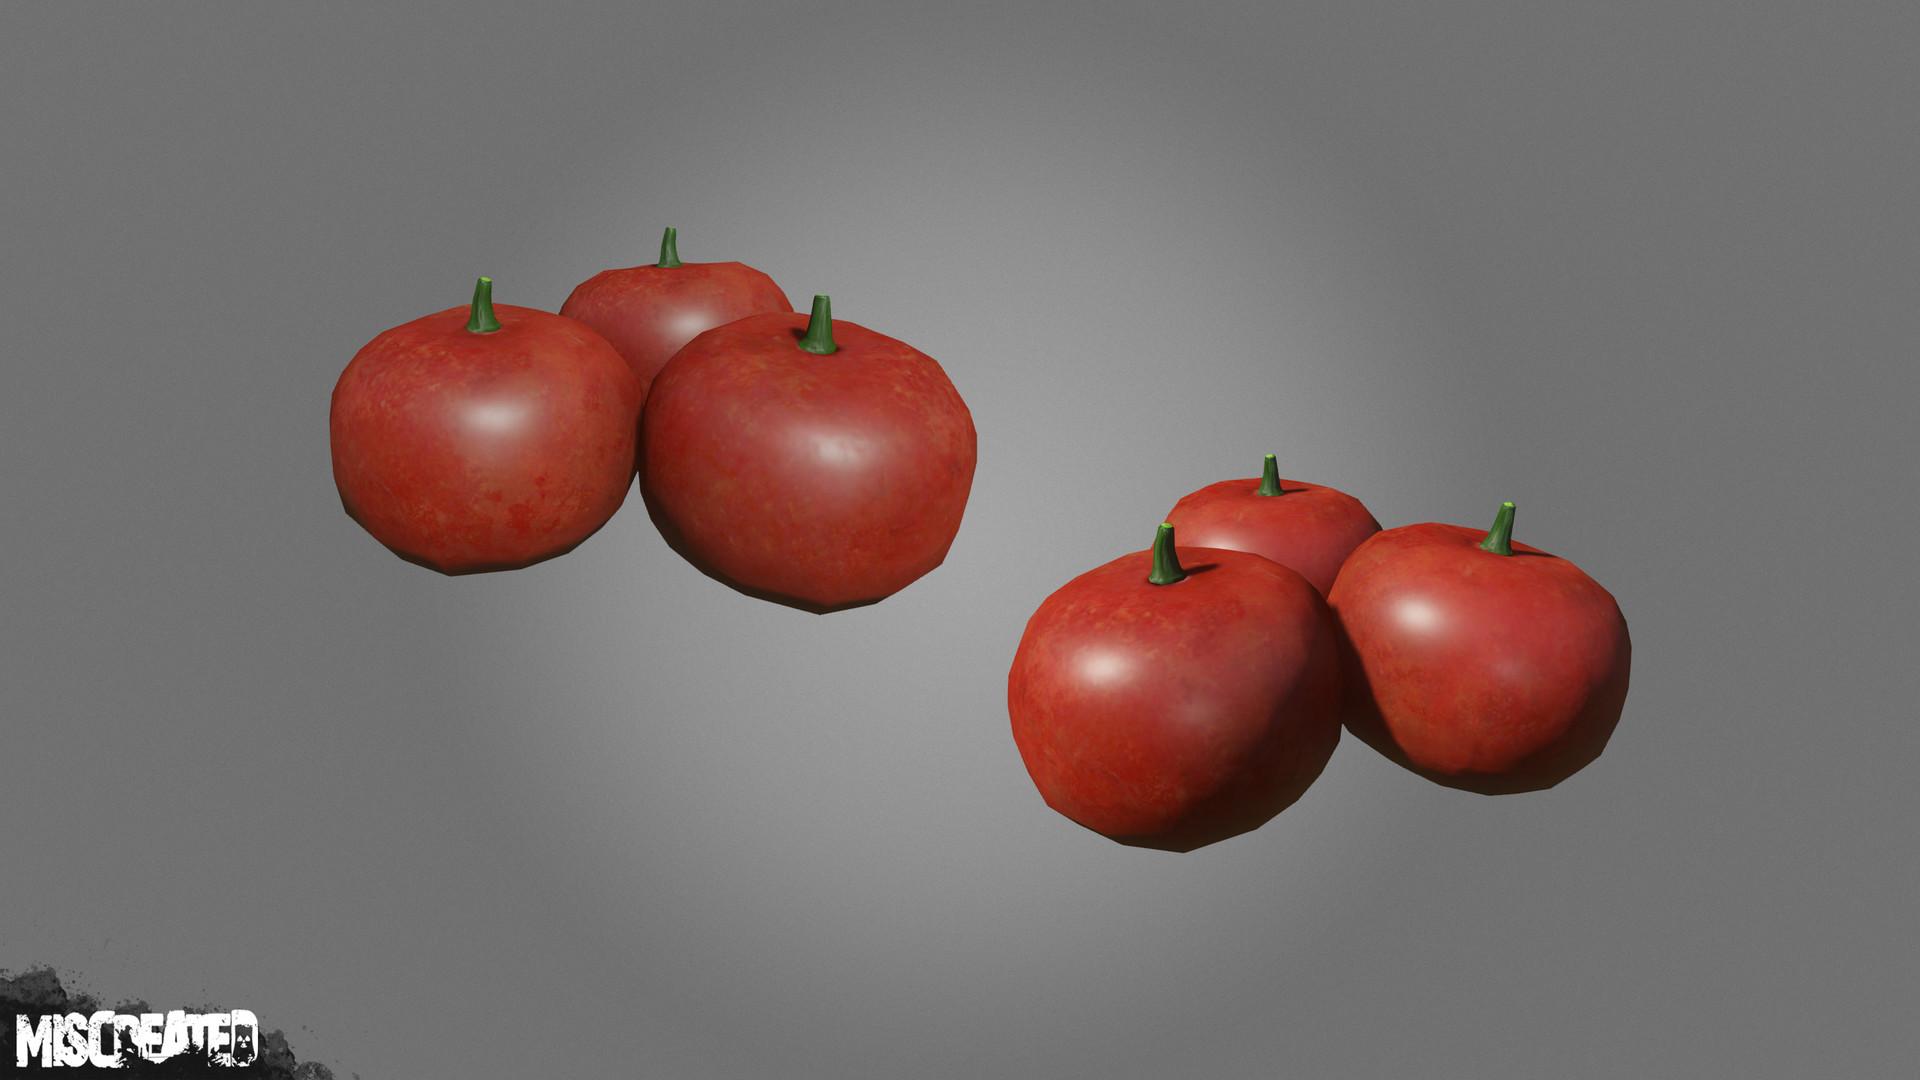 Carl kent tomatoes